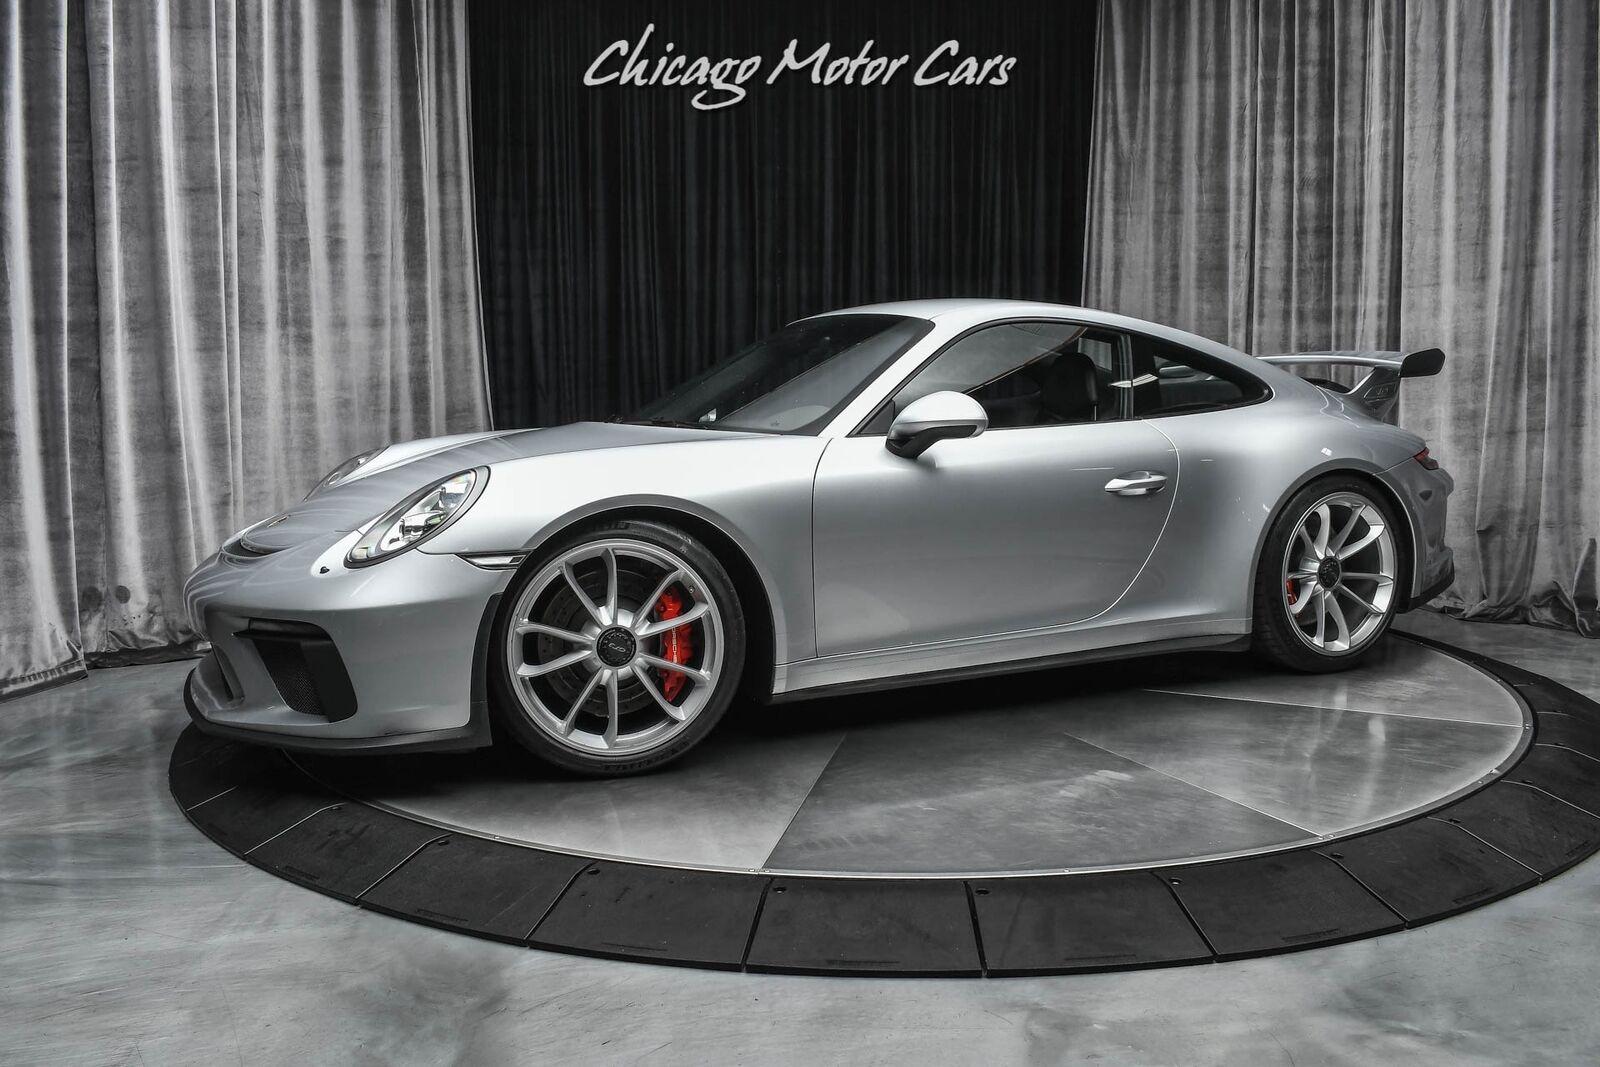 2018 Porsche 911 GT3 Carbon Fiber Bucket Seats! Bose Audio! Rhodium Silver Metal